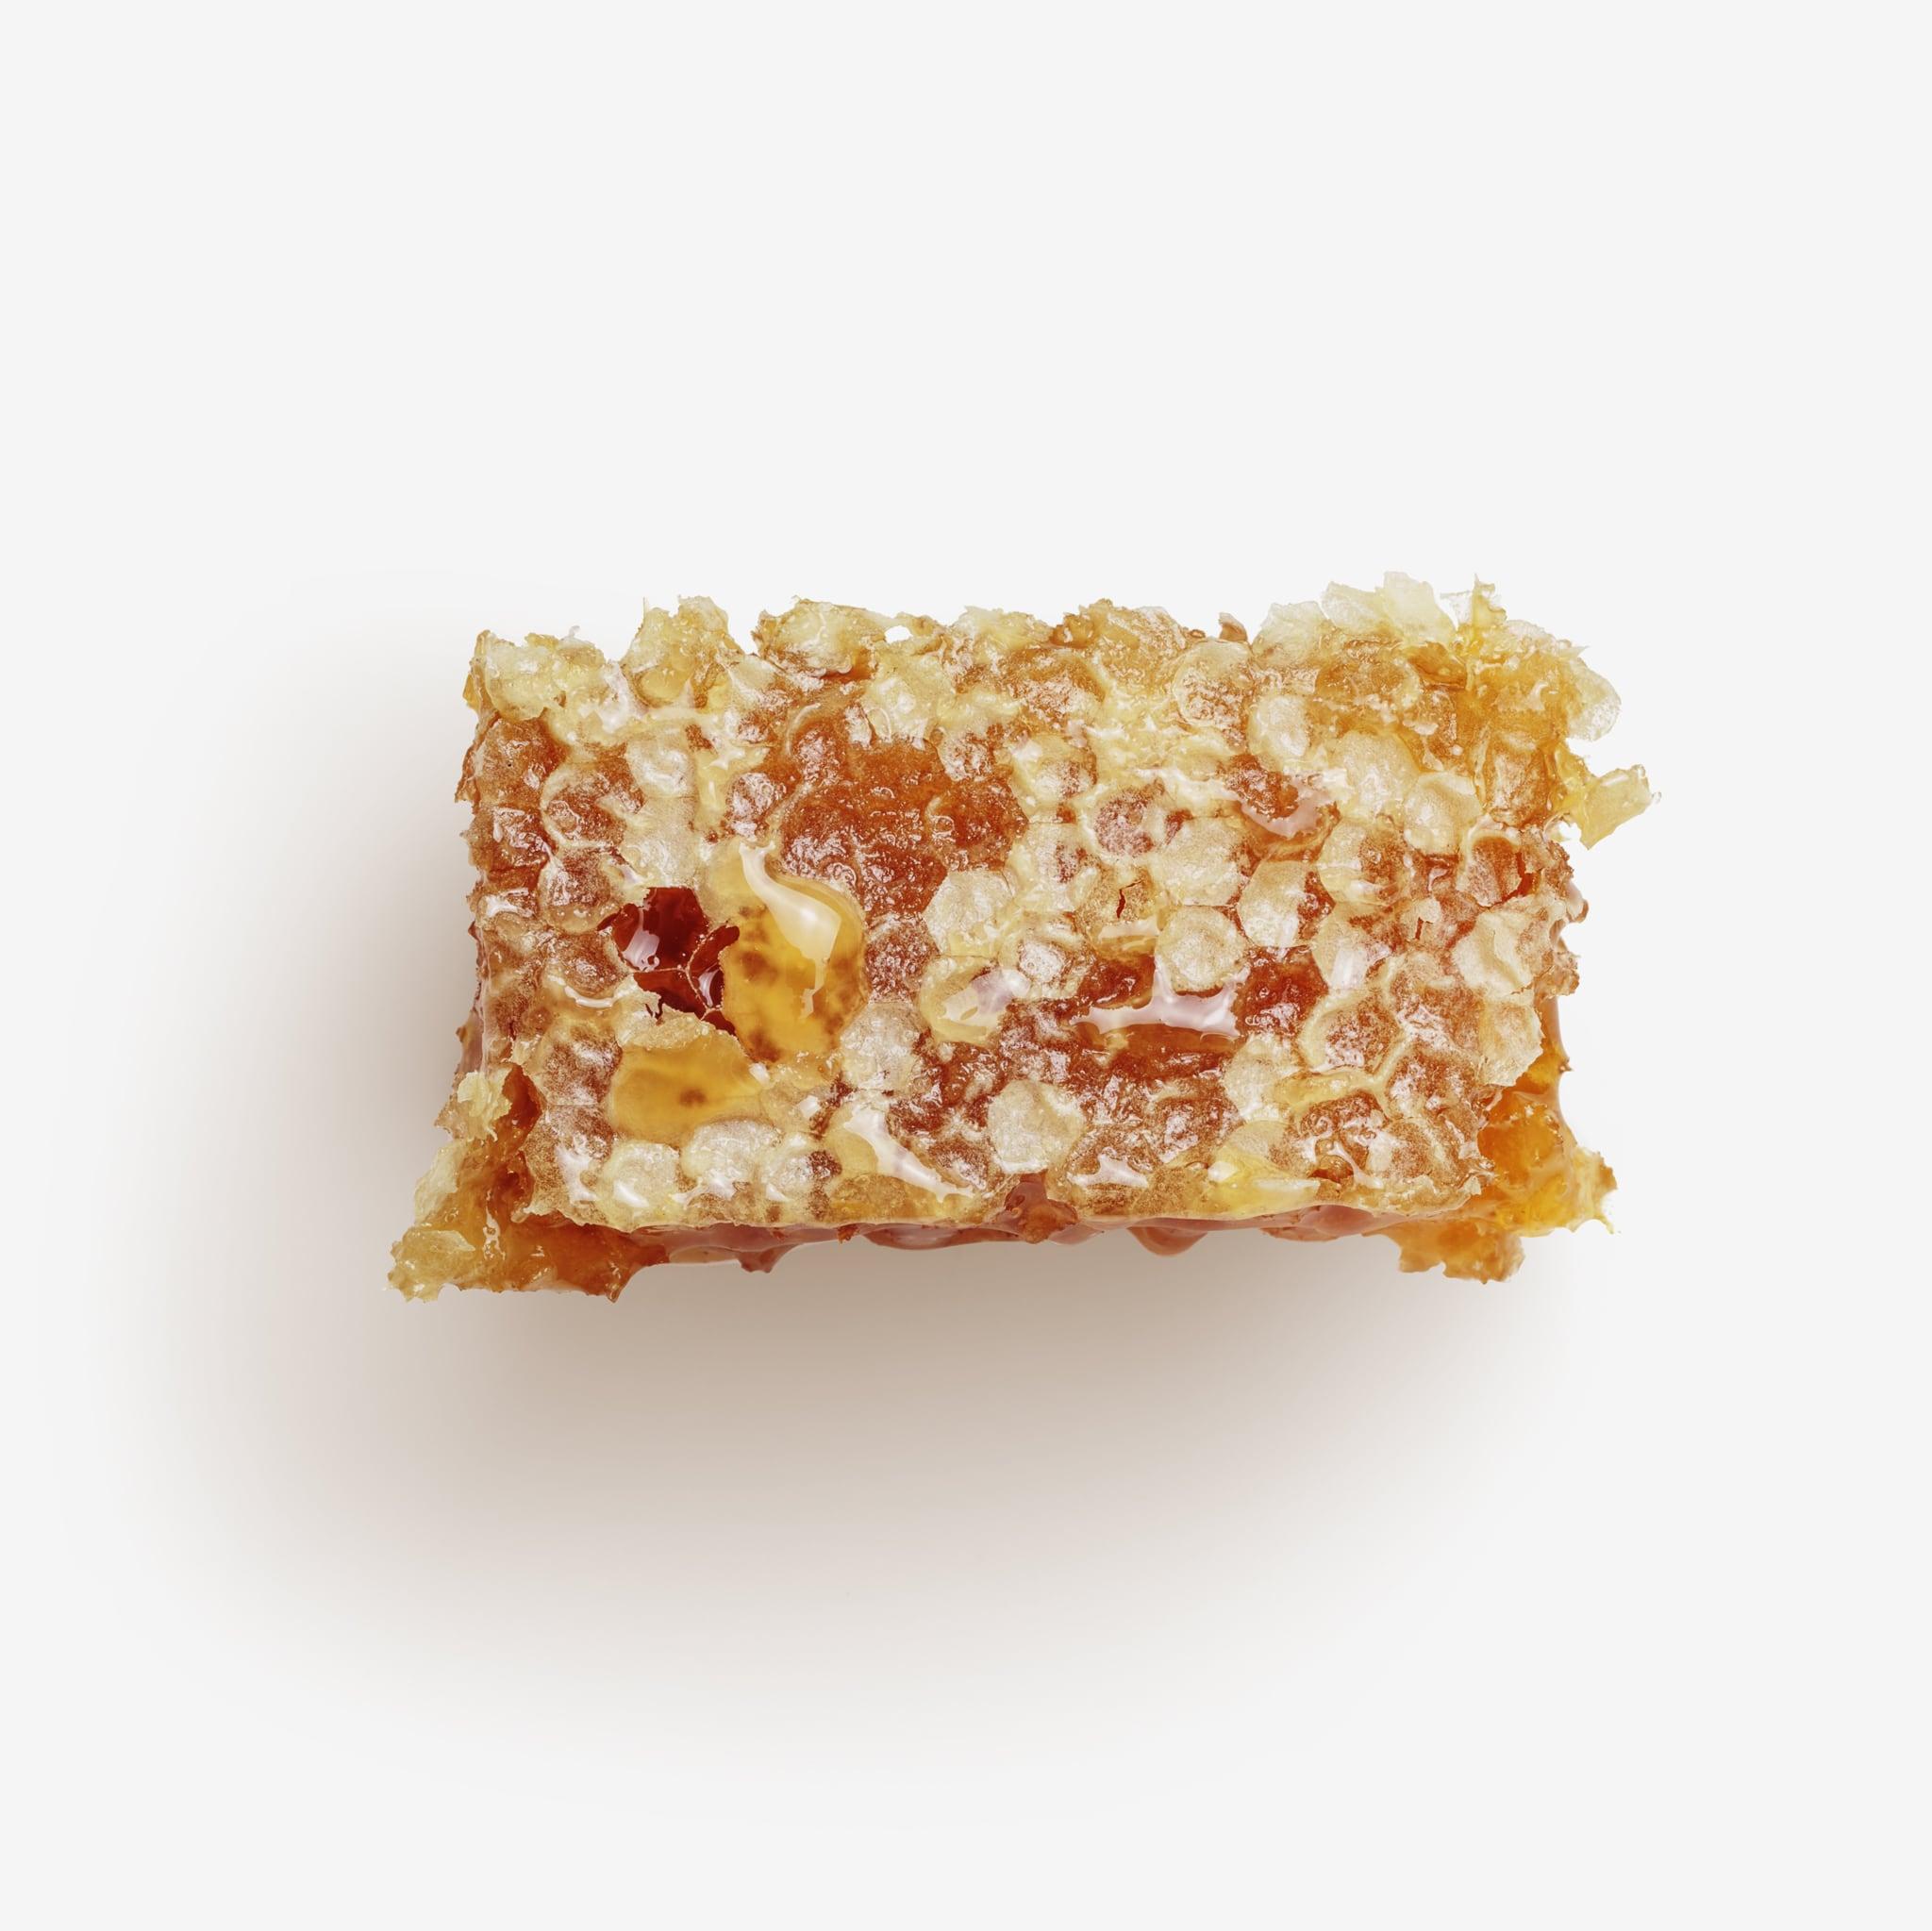 Honey image asset with transparent background